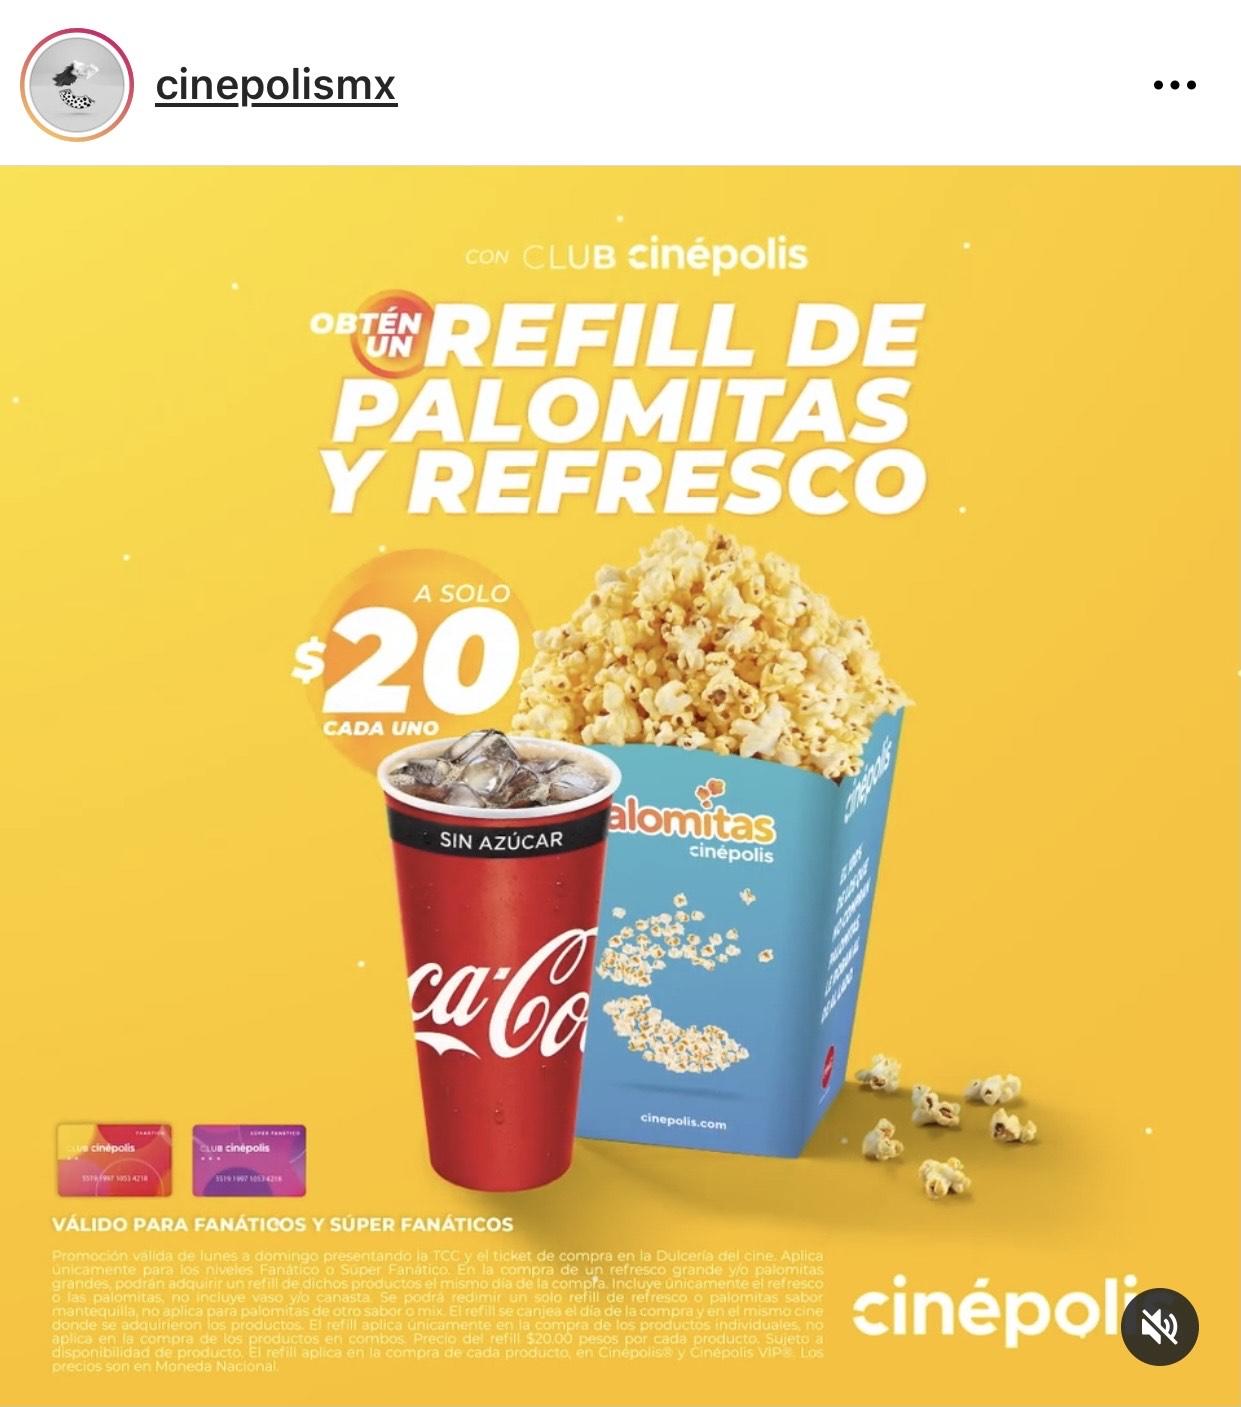 Cinépolis: Palomitas y refresco refill a $20